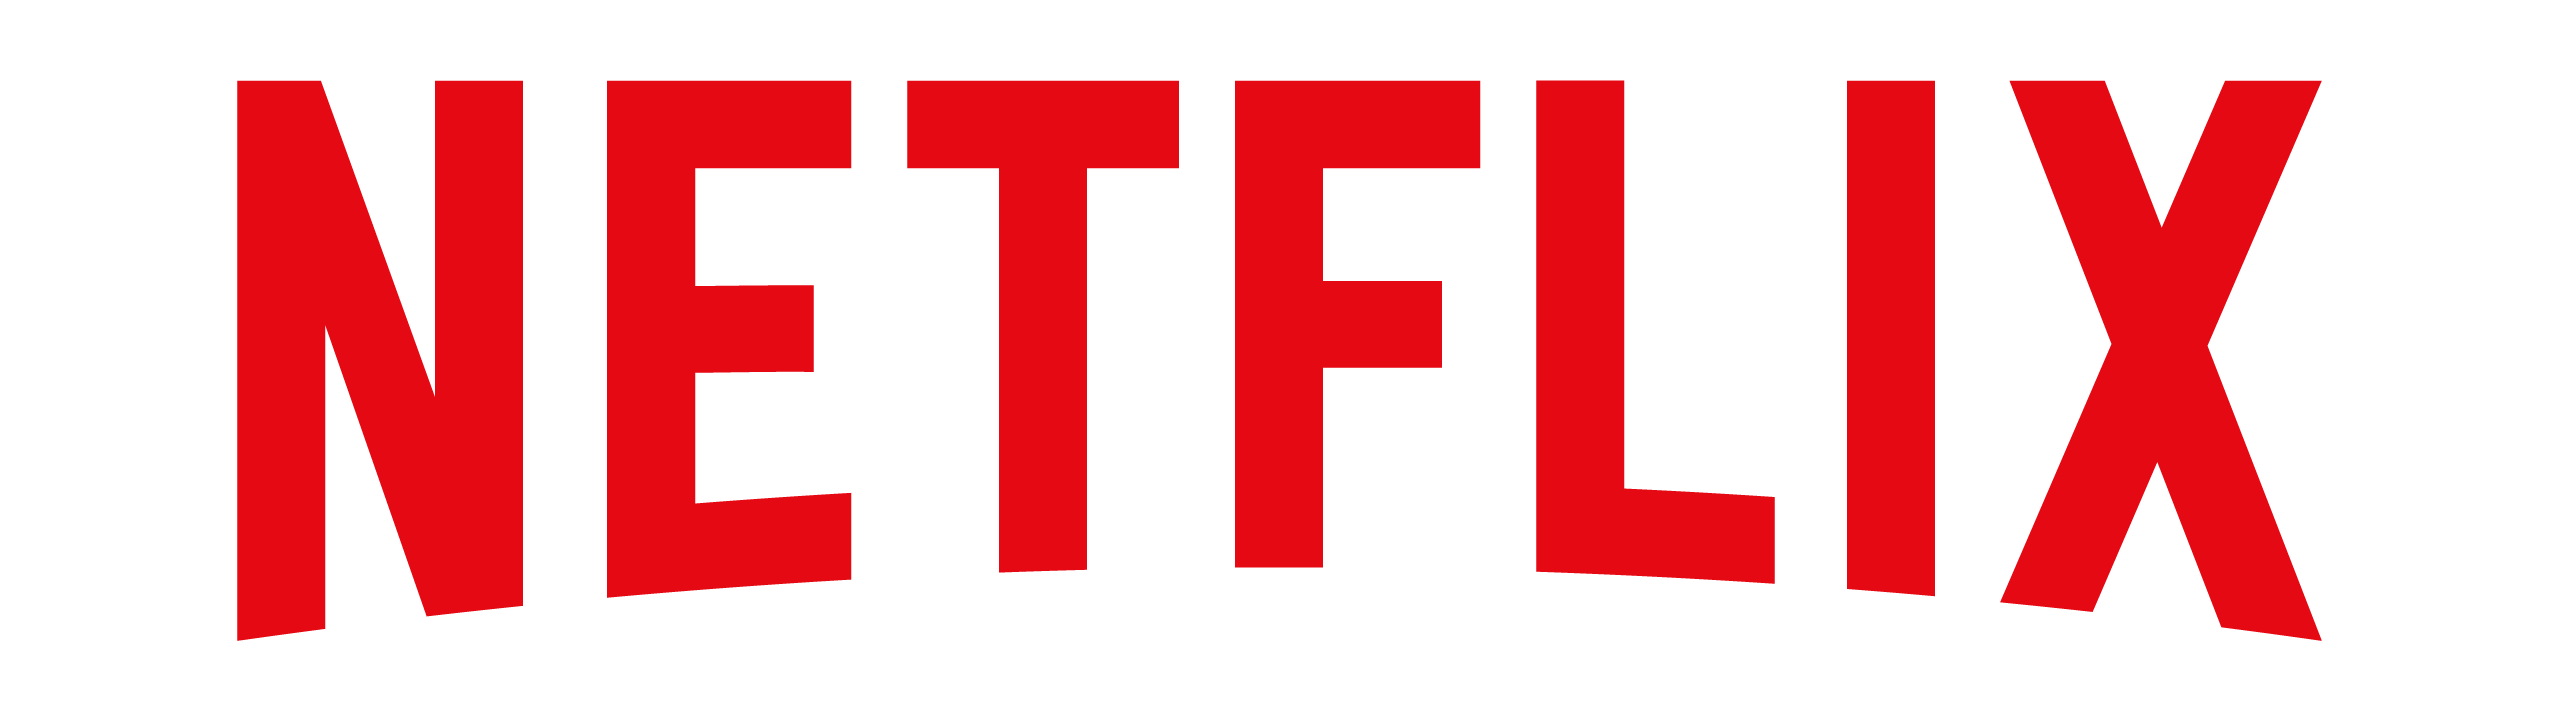 Netflix - First Cut Lab 2021